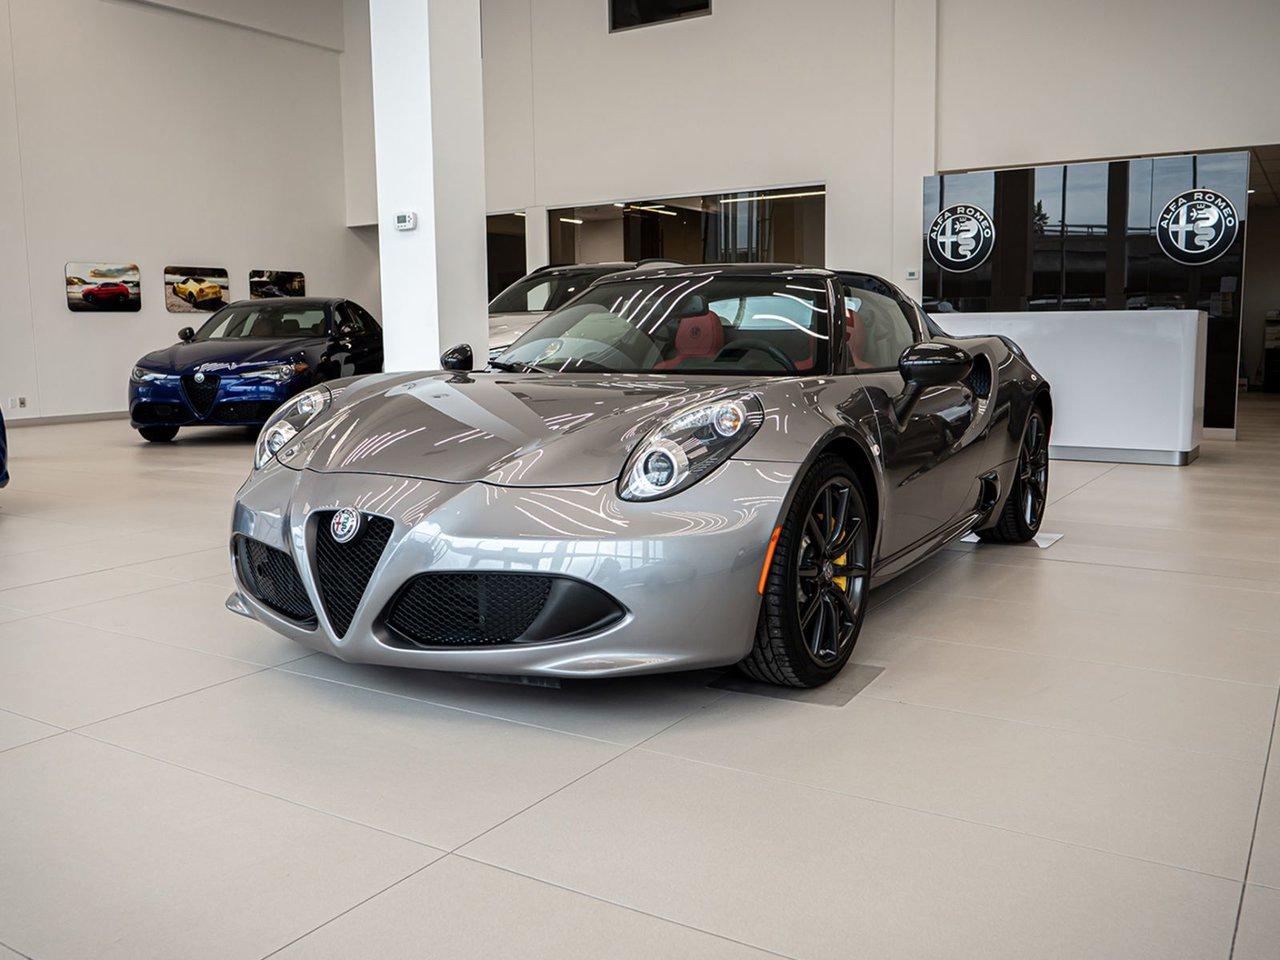 2019 Alfa romeo  4C Spider Akropovic exhaust NEW CAR